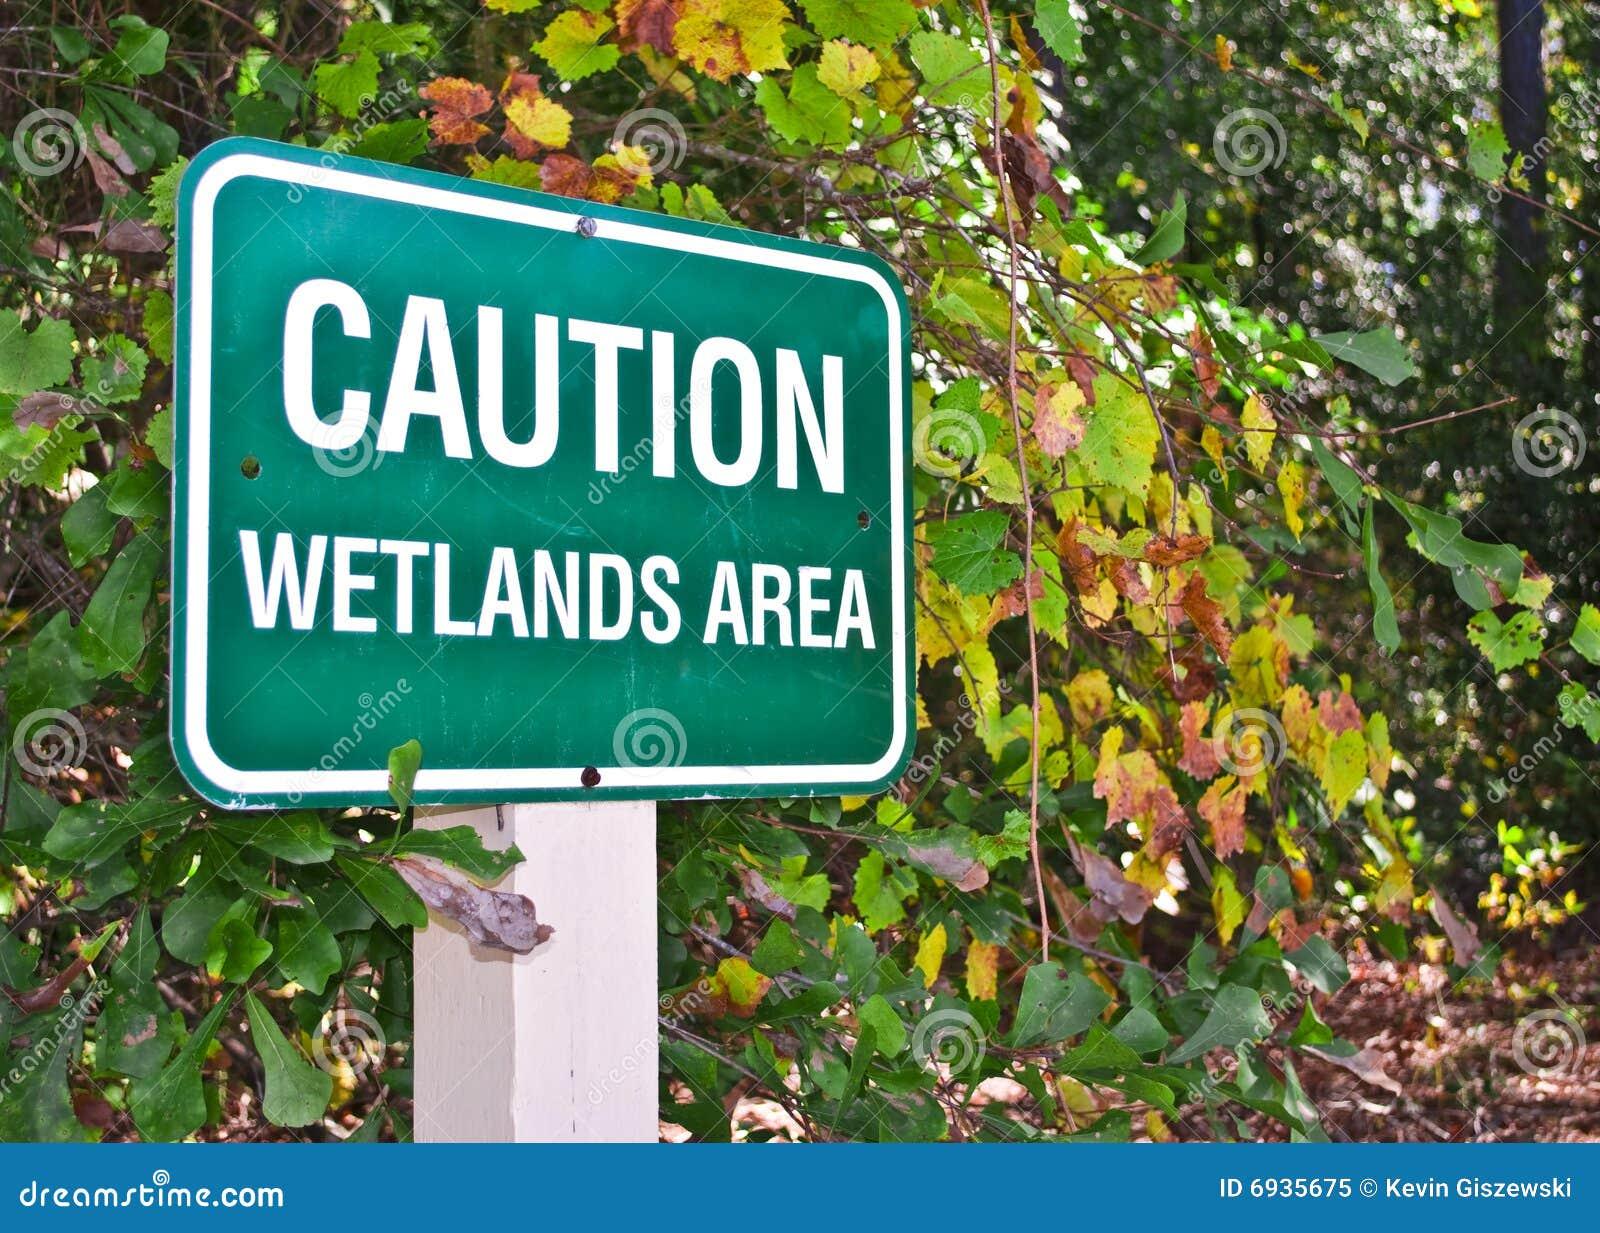 Caution Wetlands Area Sign